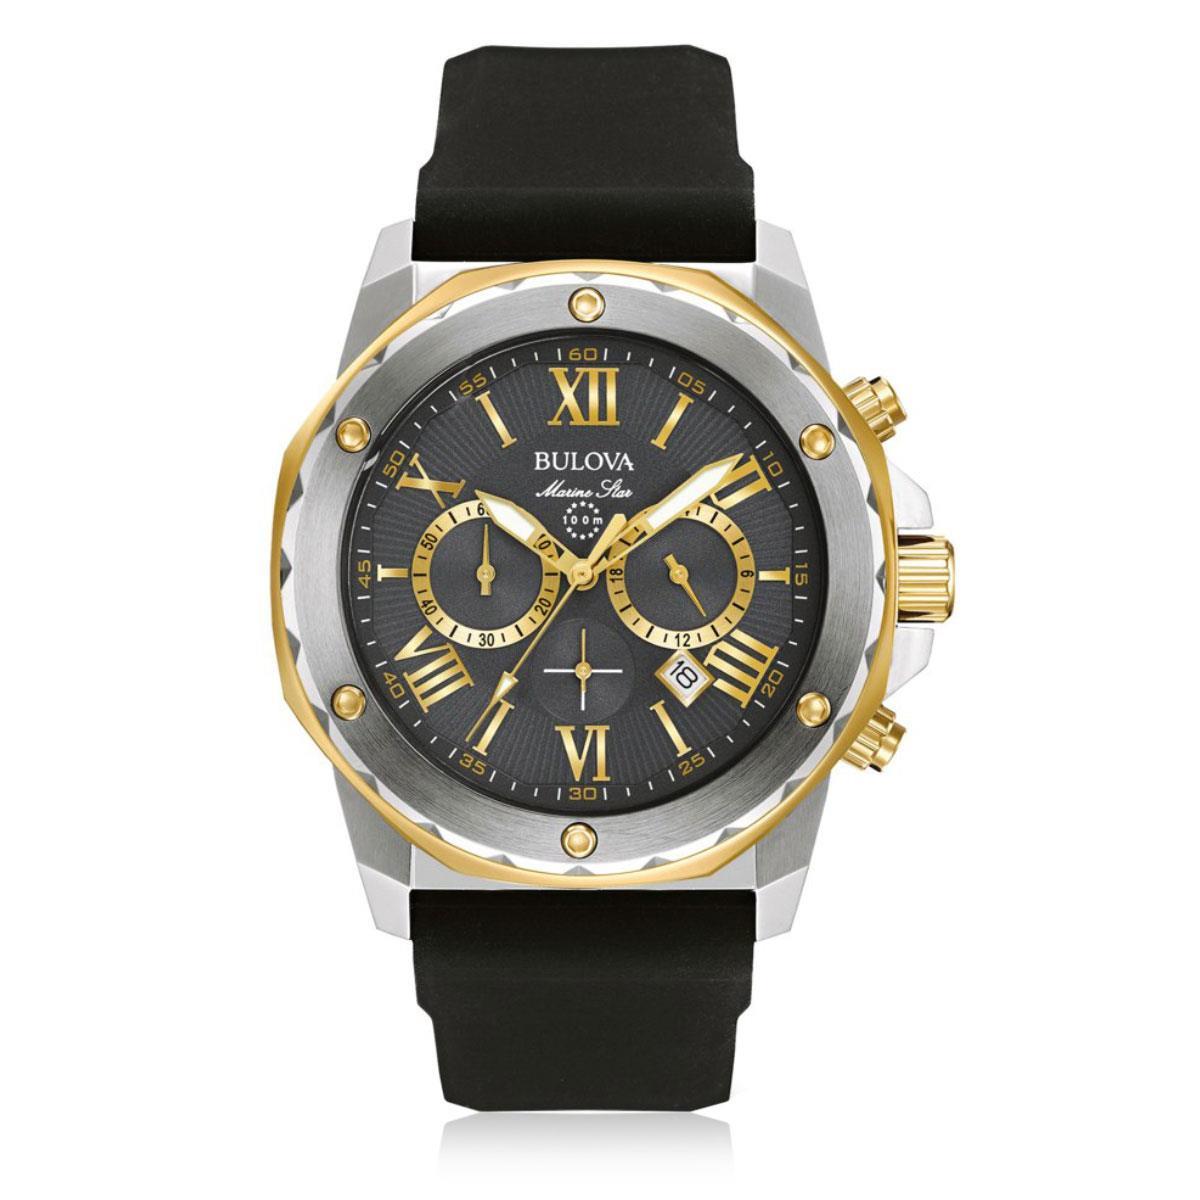 6952e1bca7180 Relógio Masculino Bulova Marine Star Quartz WB31943C Borracha Preta